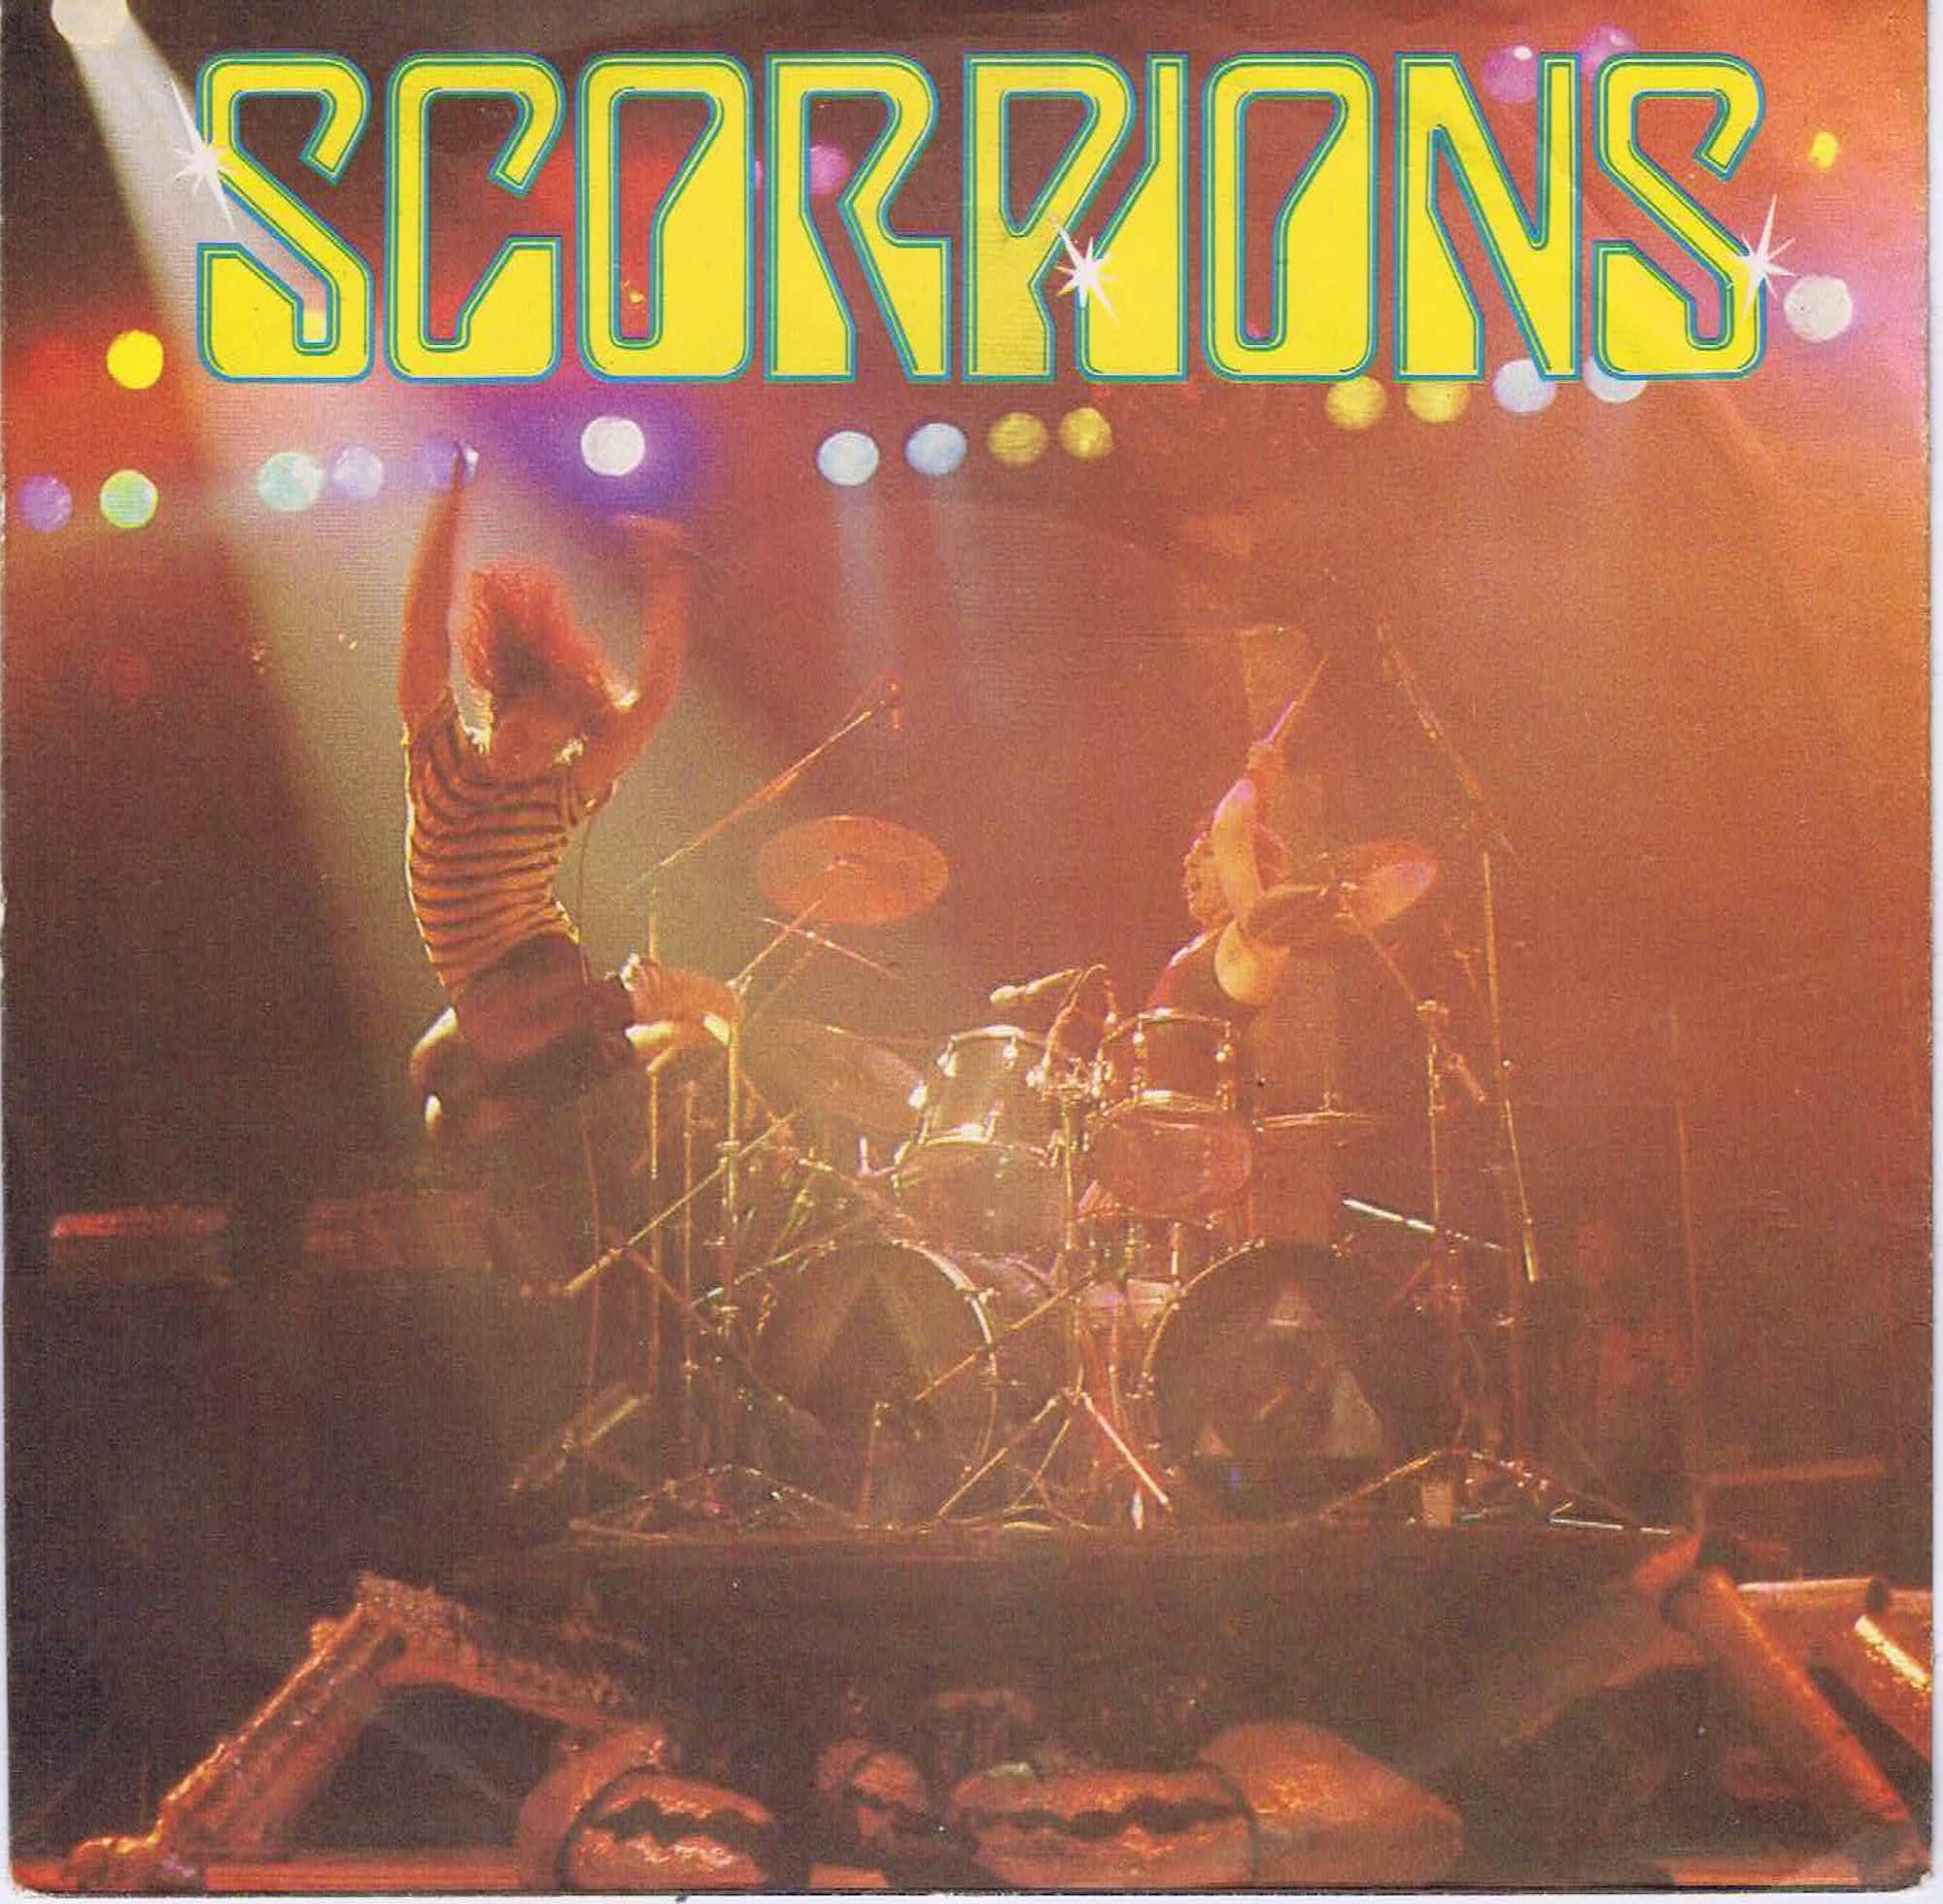 Scorpions The Zoo Har 5212 7 Inch Vinyl Record Wax